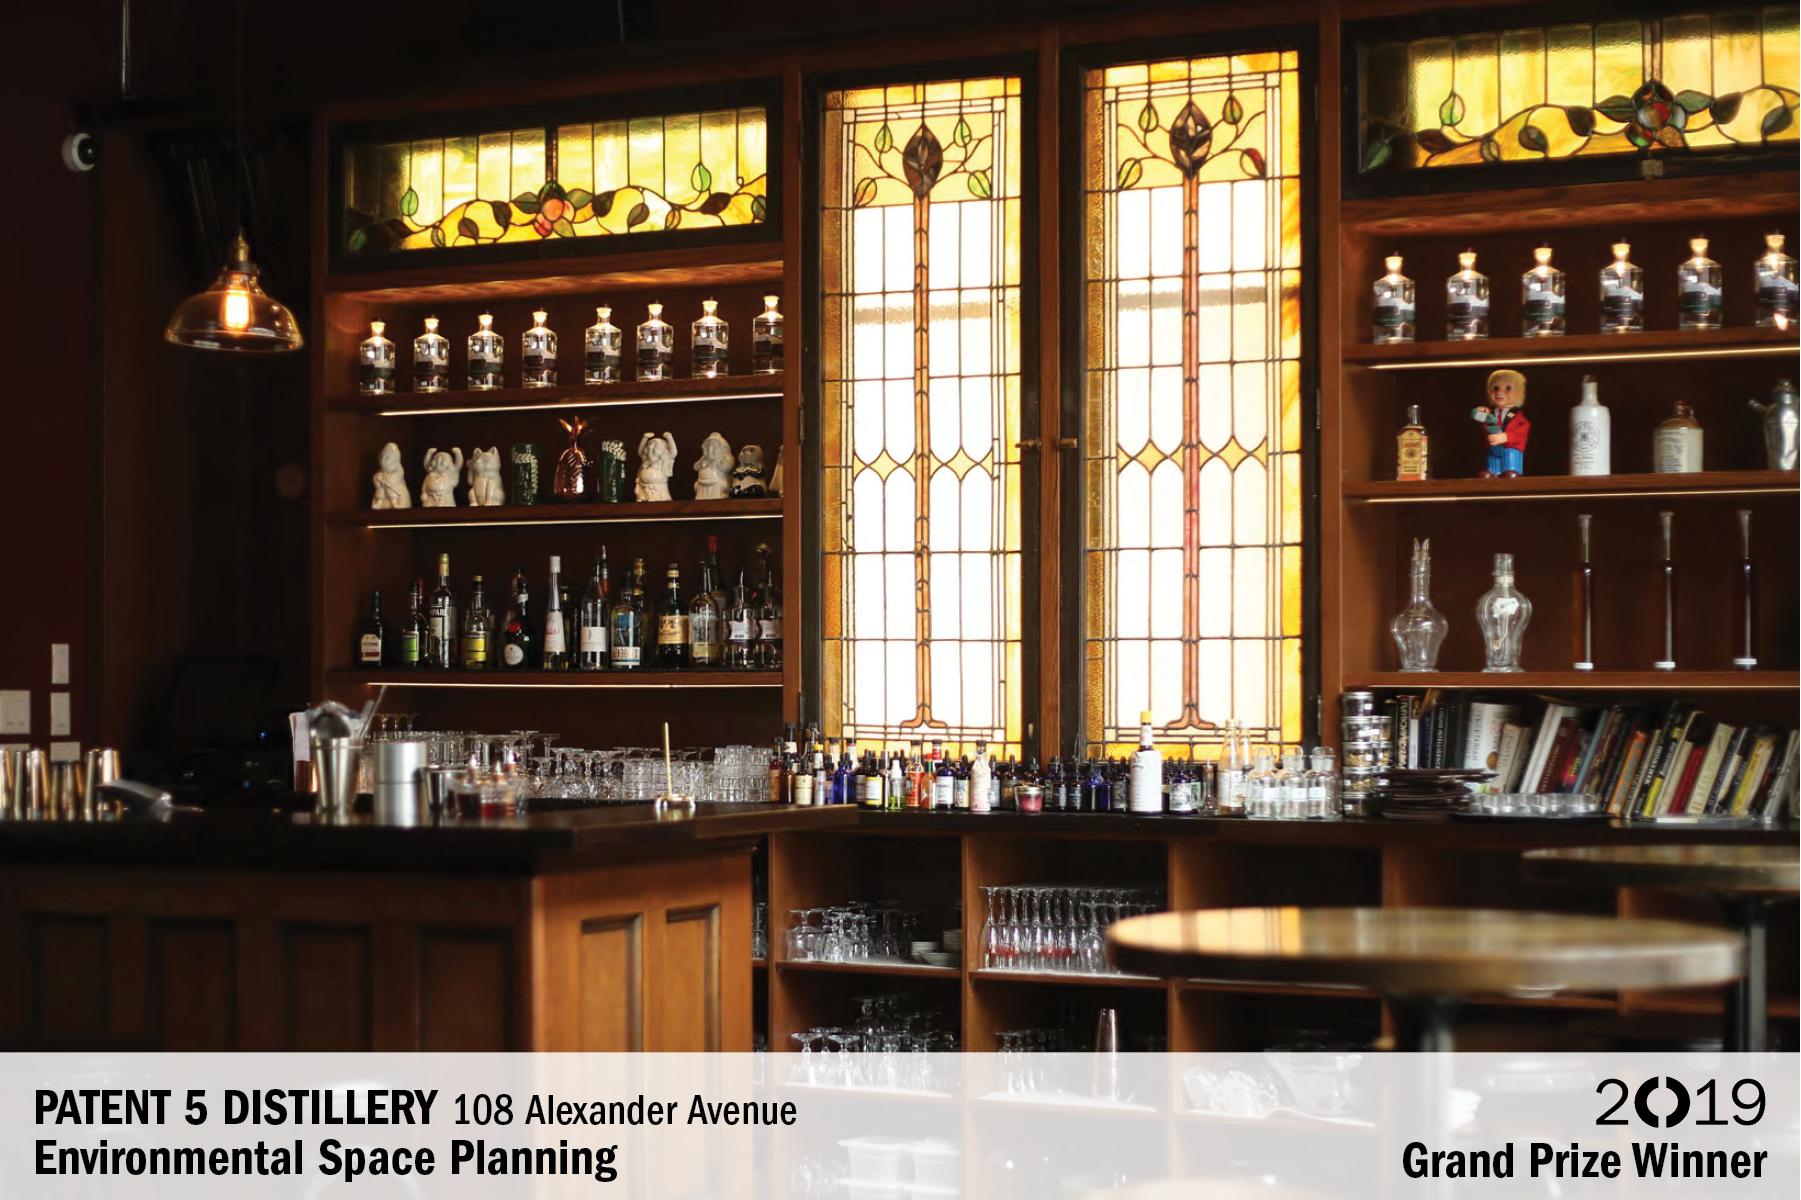 Patent 5 Distillery